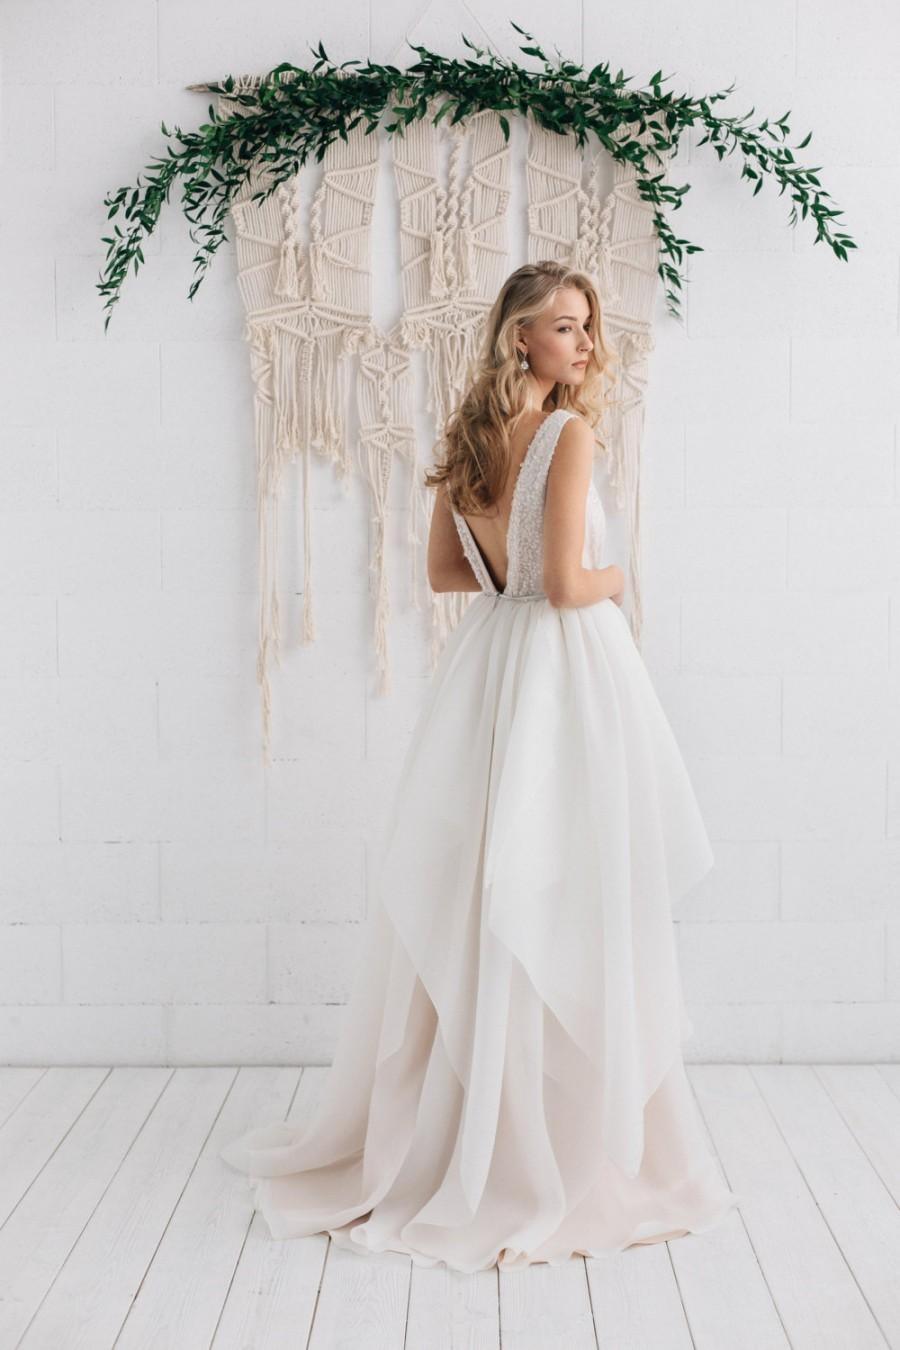 Wedding Dress , Gown, Pastel Champagne Ivory Nude Bridal Dress ,V ...